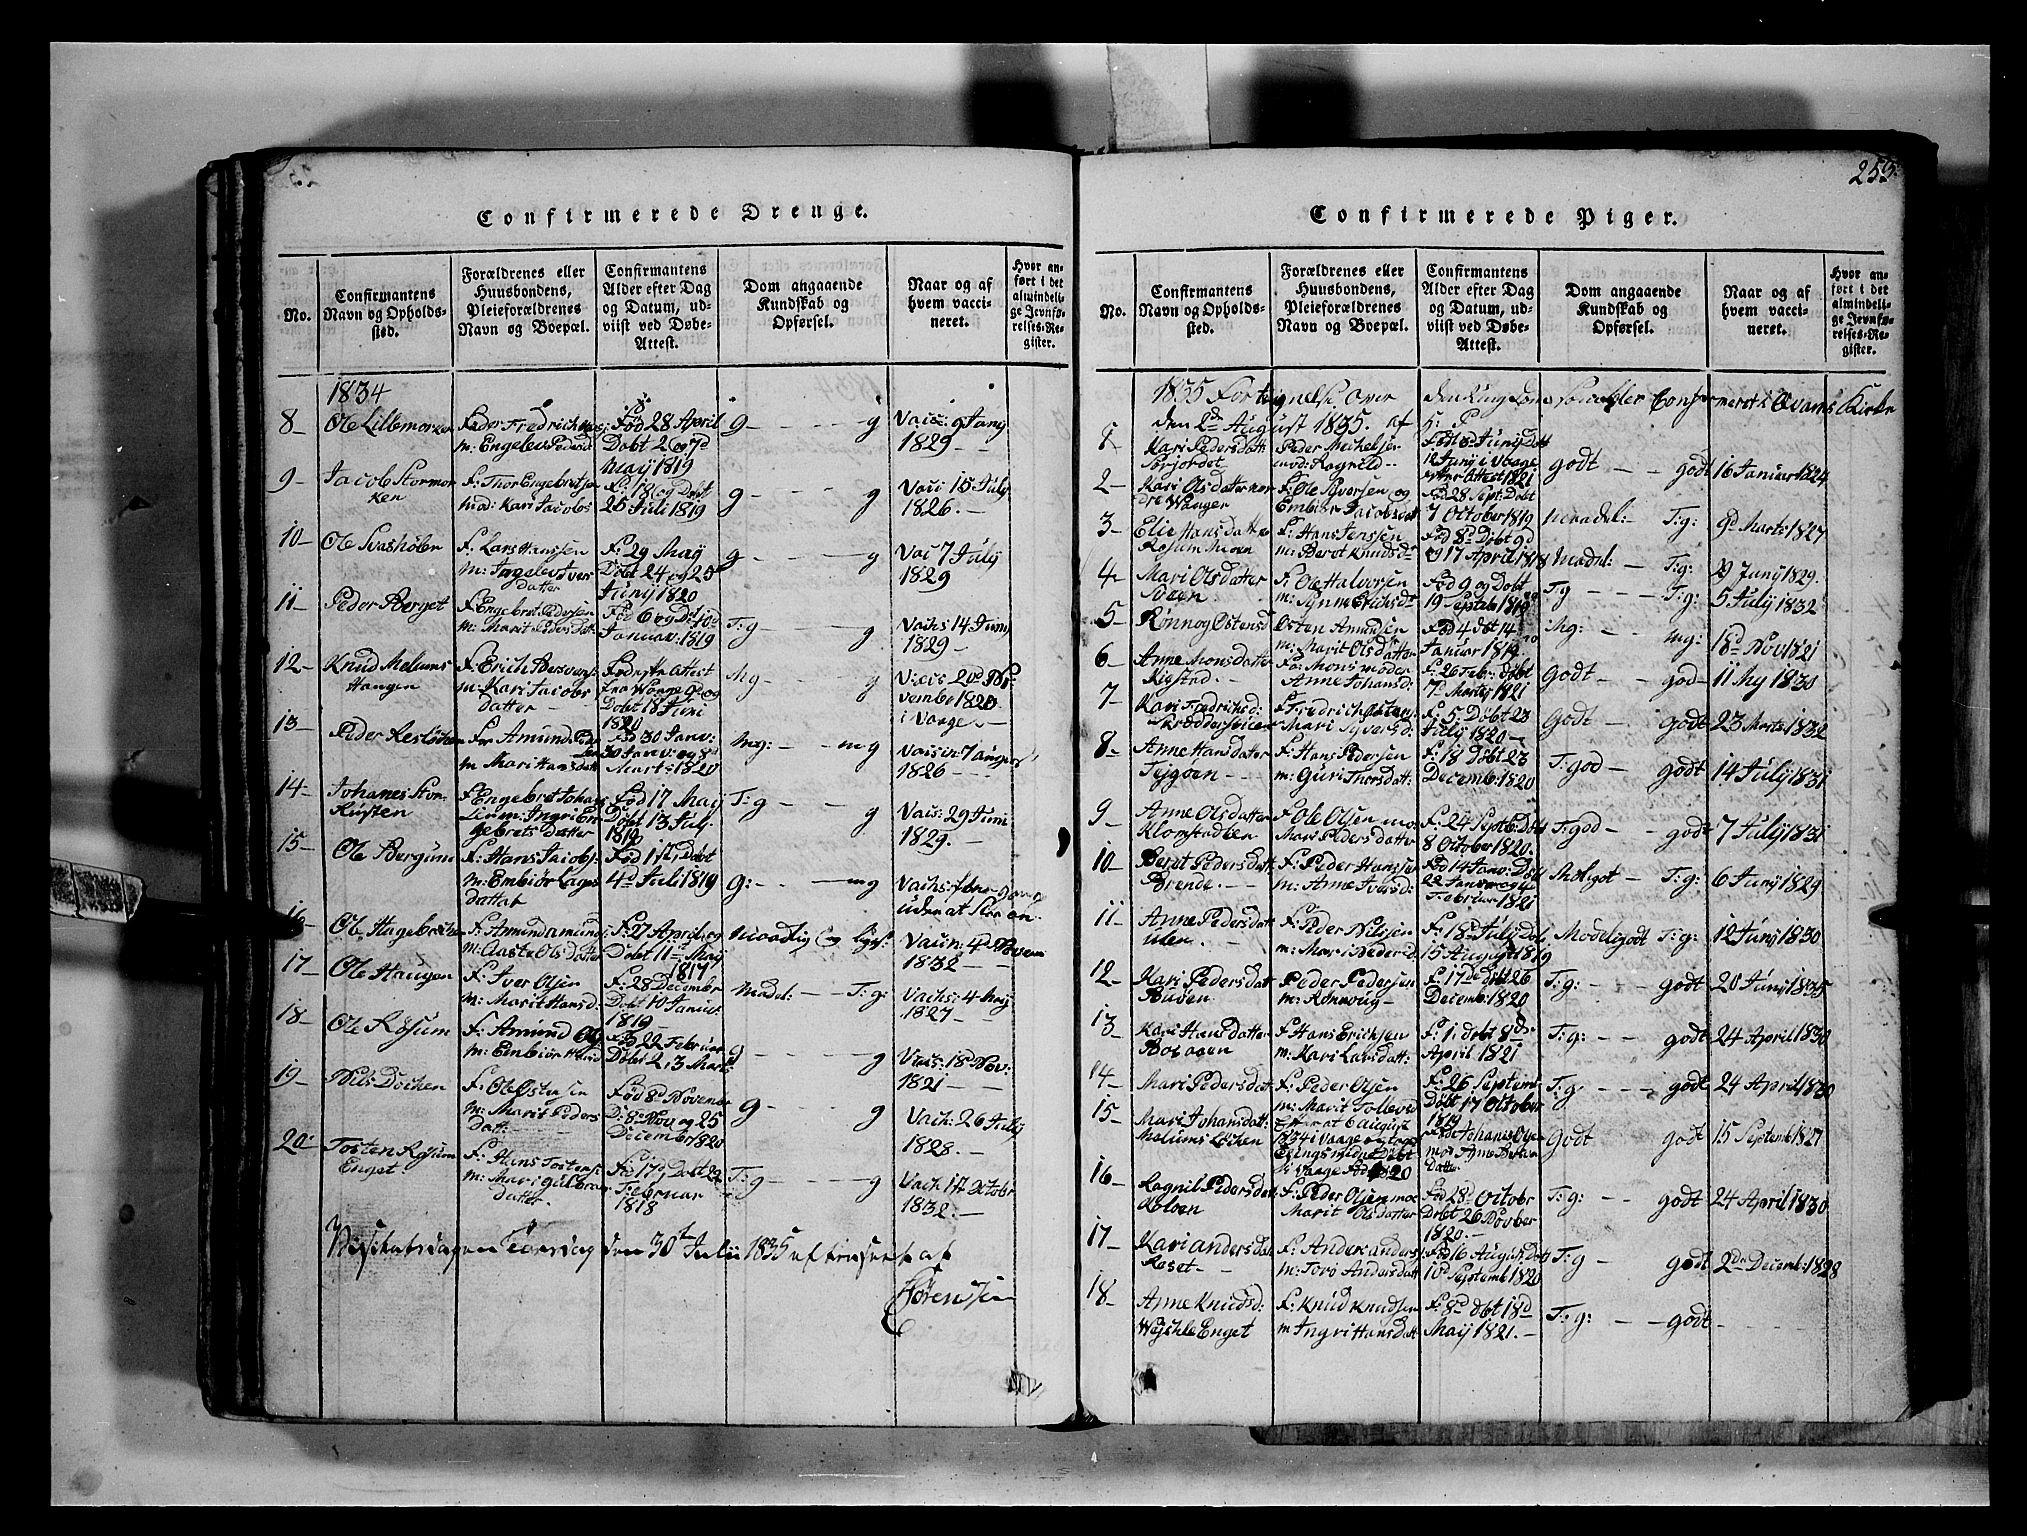 SAH, Fron prestekontor, H/Ha/Hab/L0002: Klokkerbok nr. 2, 1816-1850, s. 253